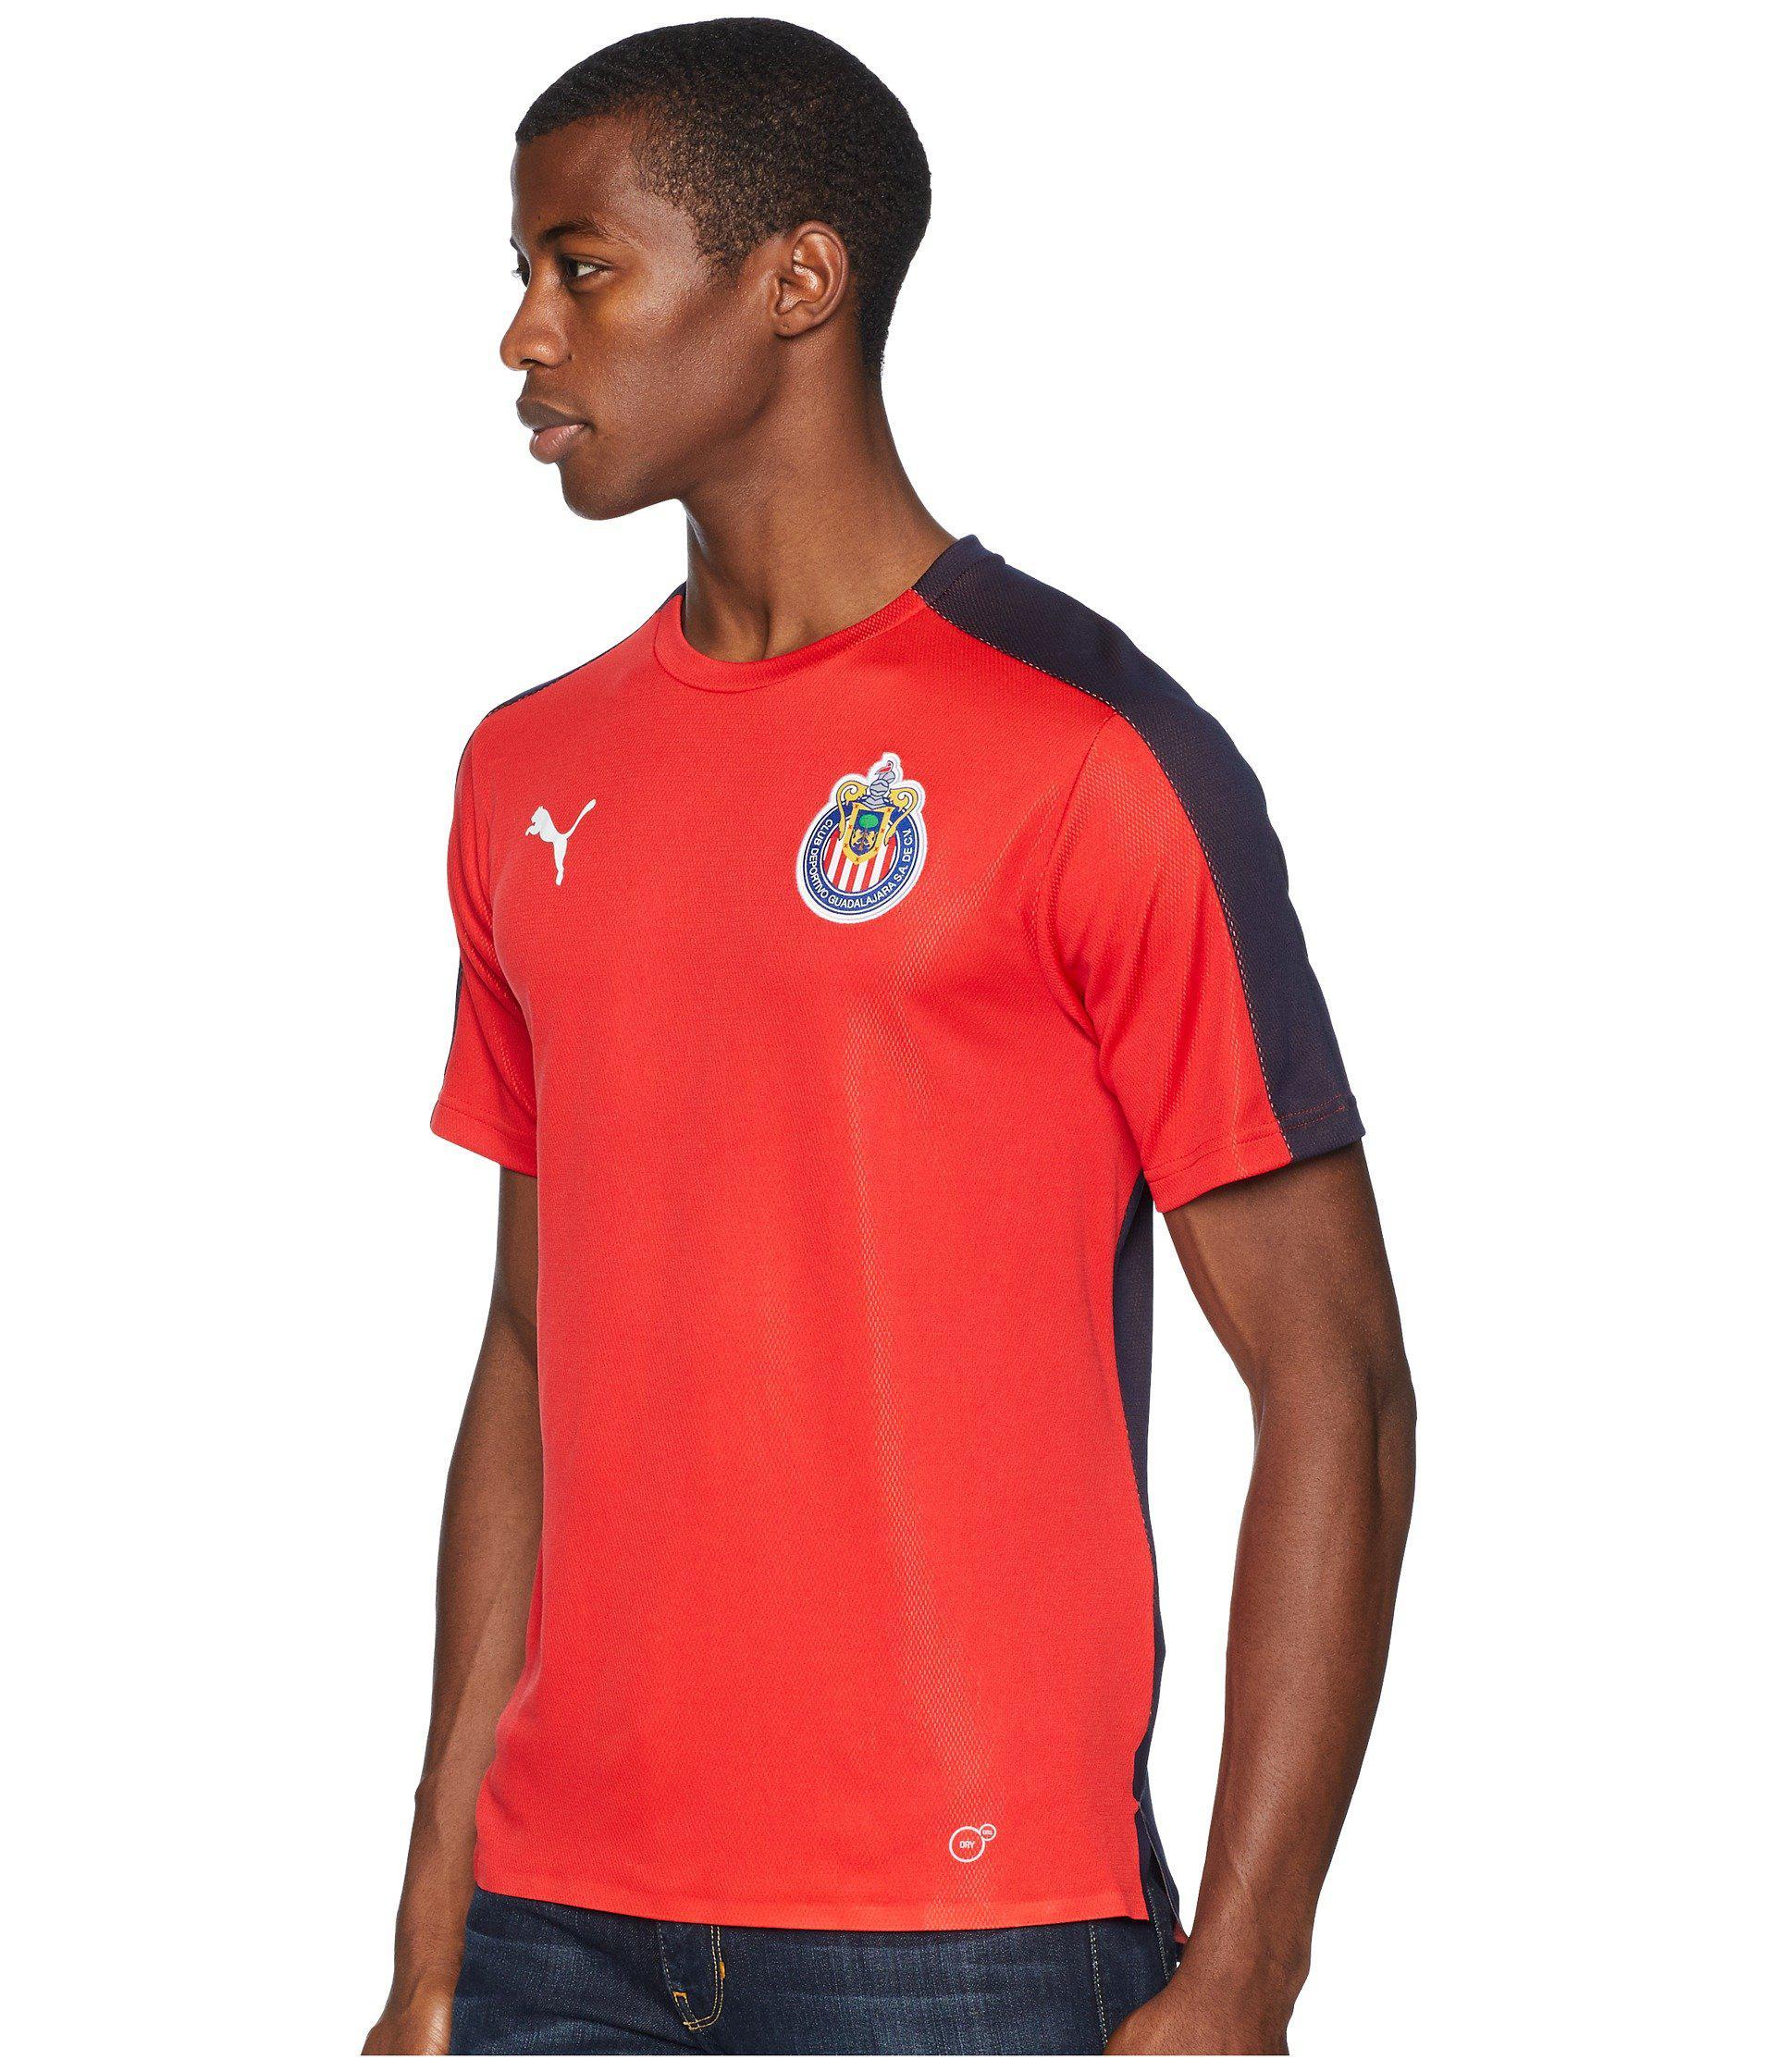 1ed03d2599c PUMA Chivas Stadium Jersey in Red for Men - Save 55% - Lyst